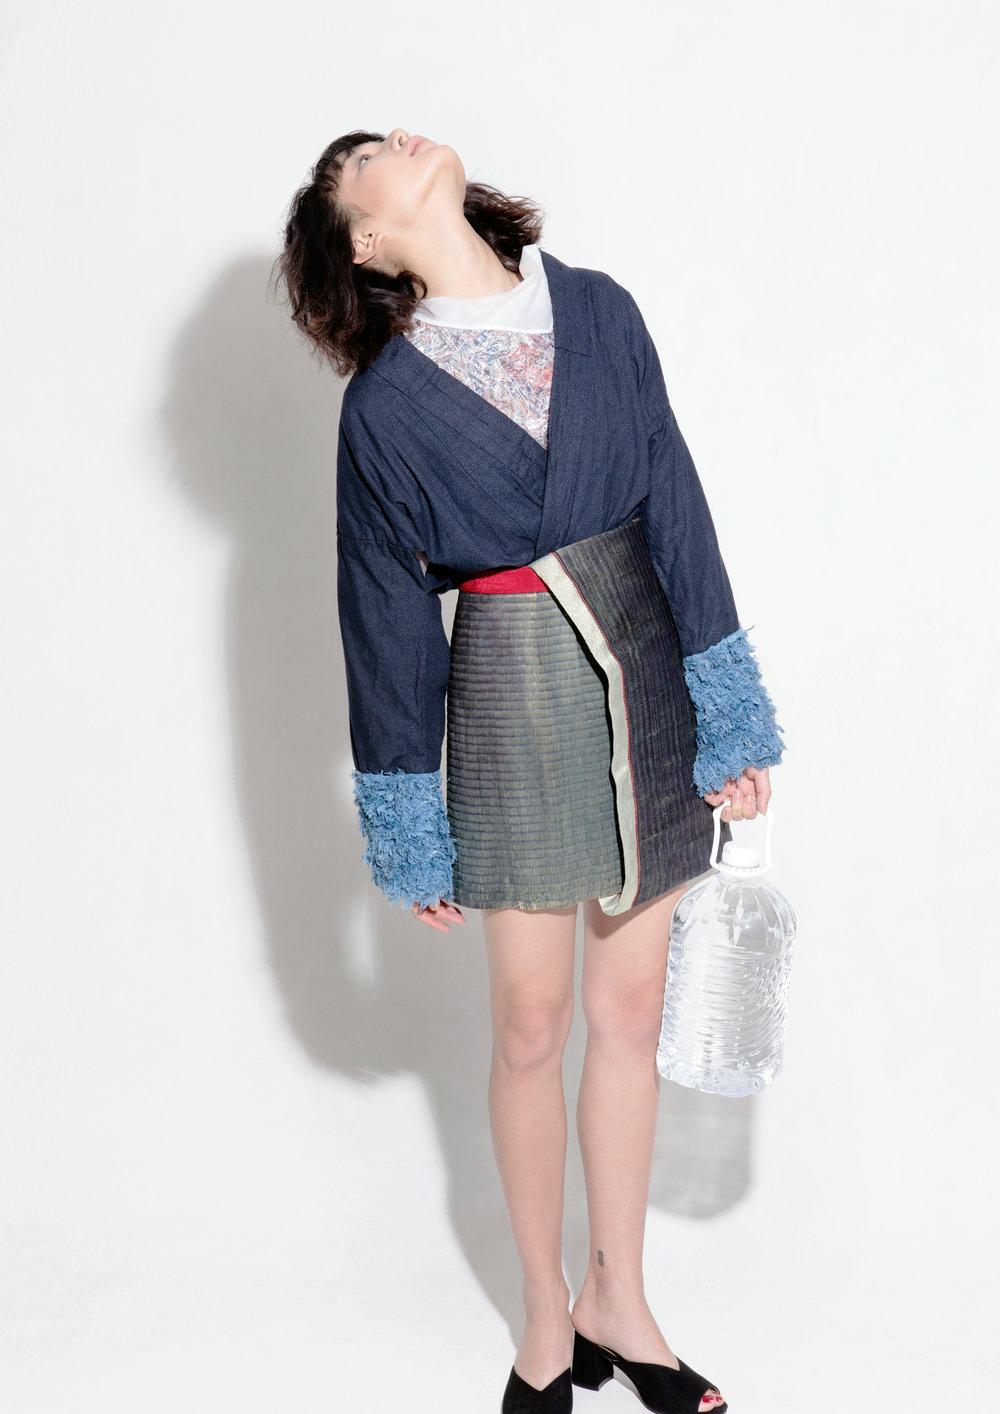 Ayako Yoshida